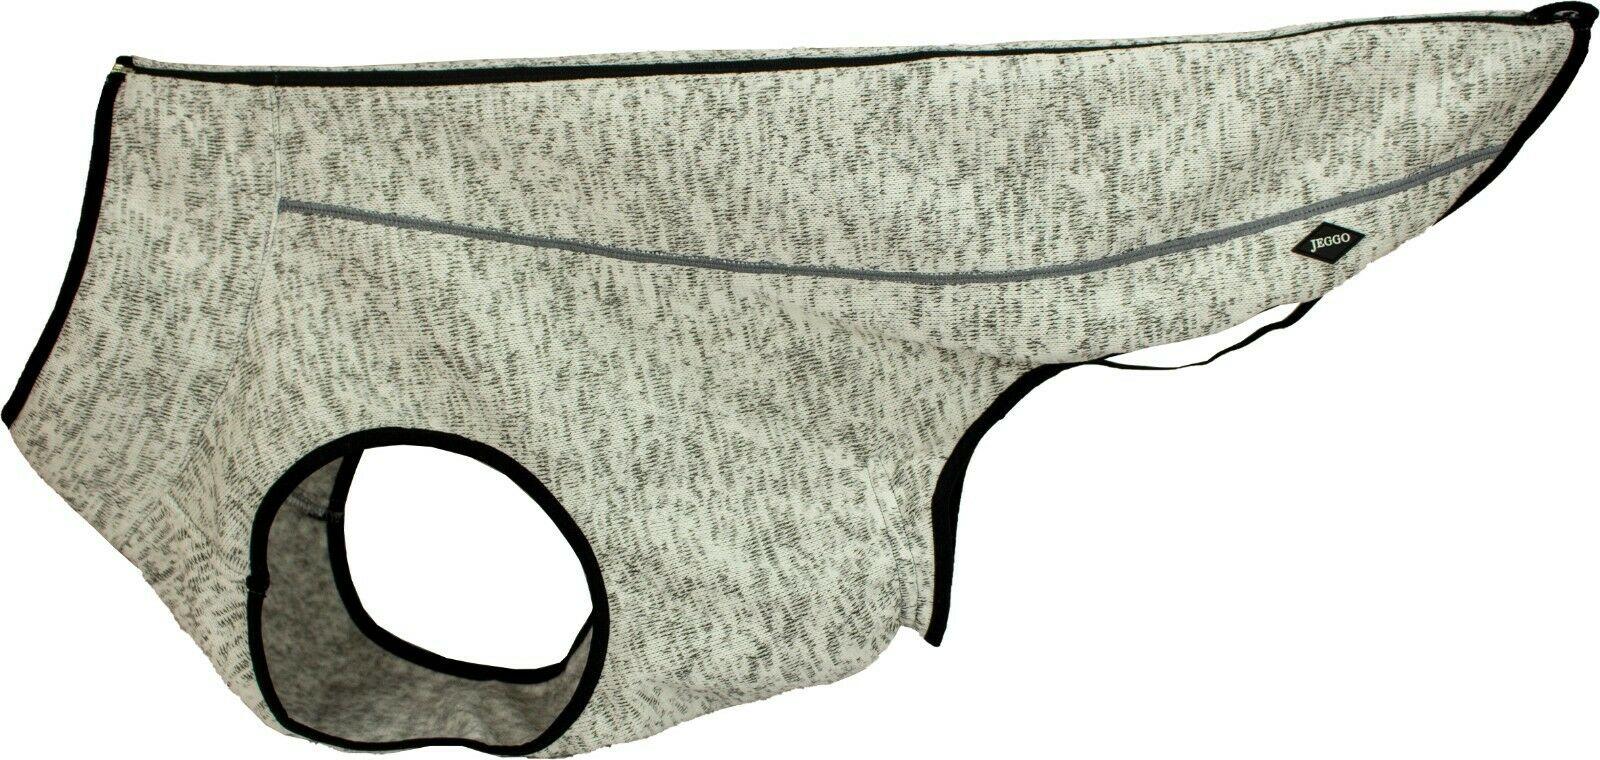 Jeggo Polarfleece Jacke hellgrau